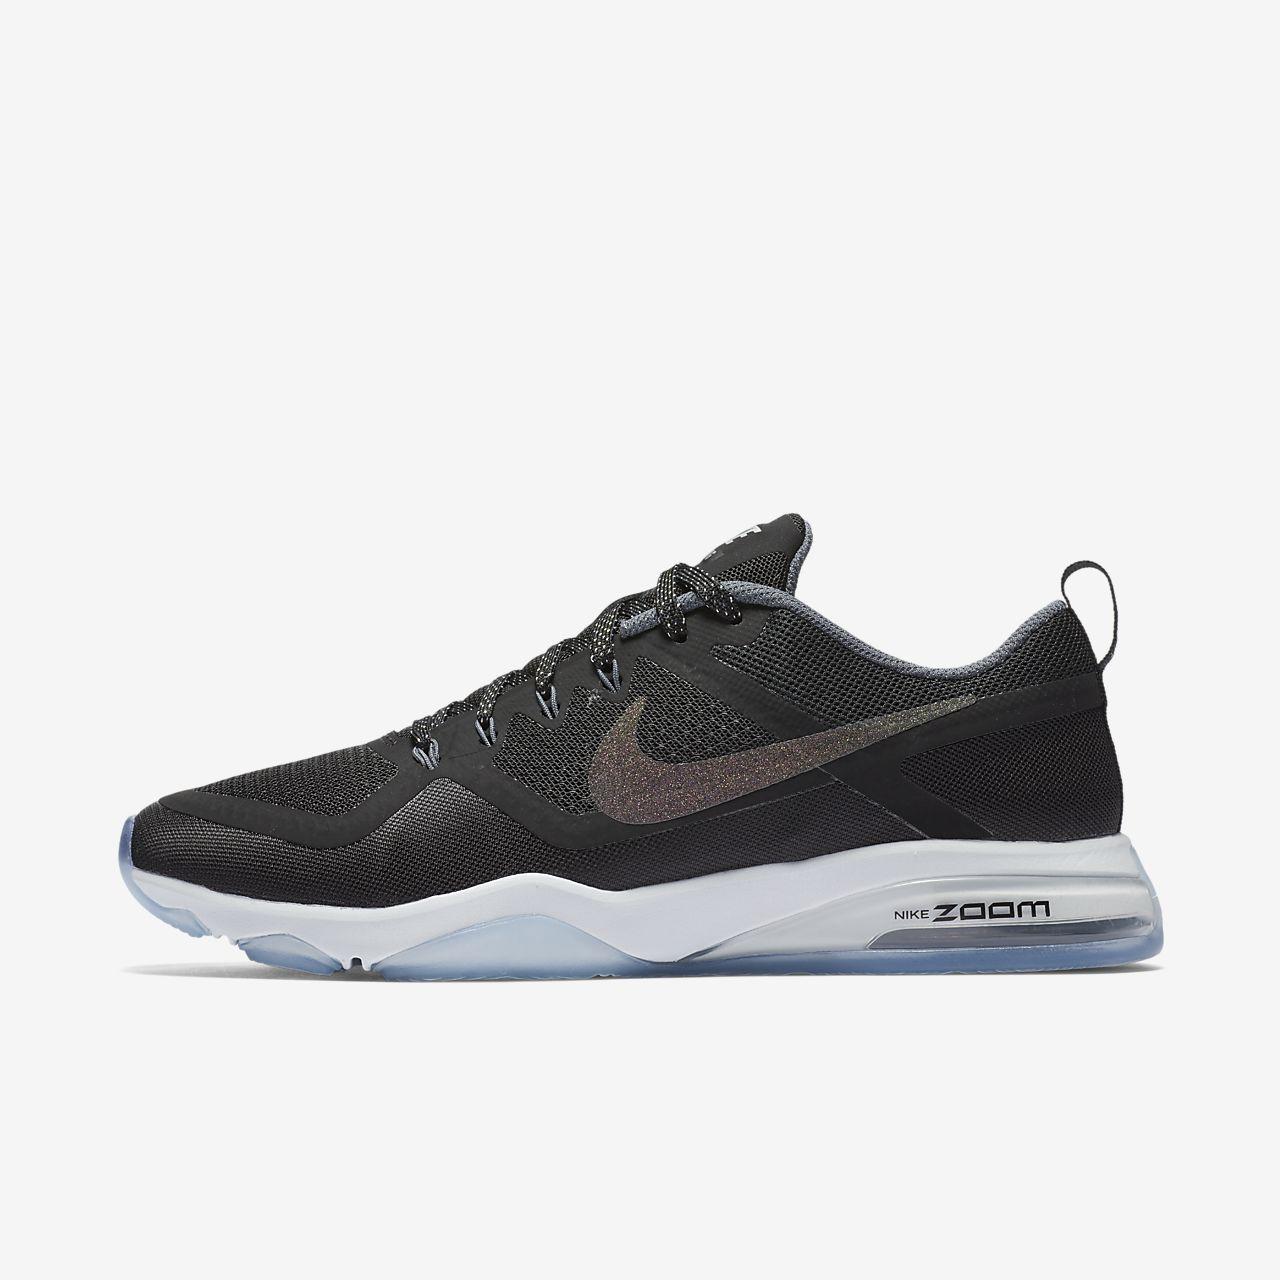 Nike Zoom Fitness Women's Training Shoes Black/White hE8254M